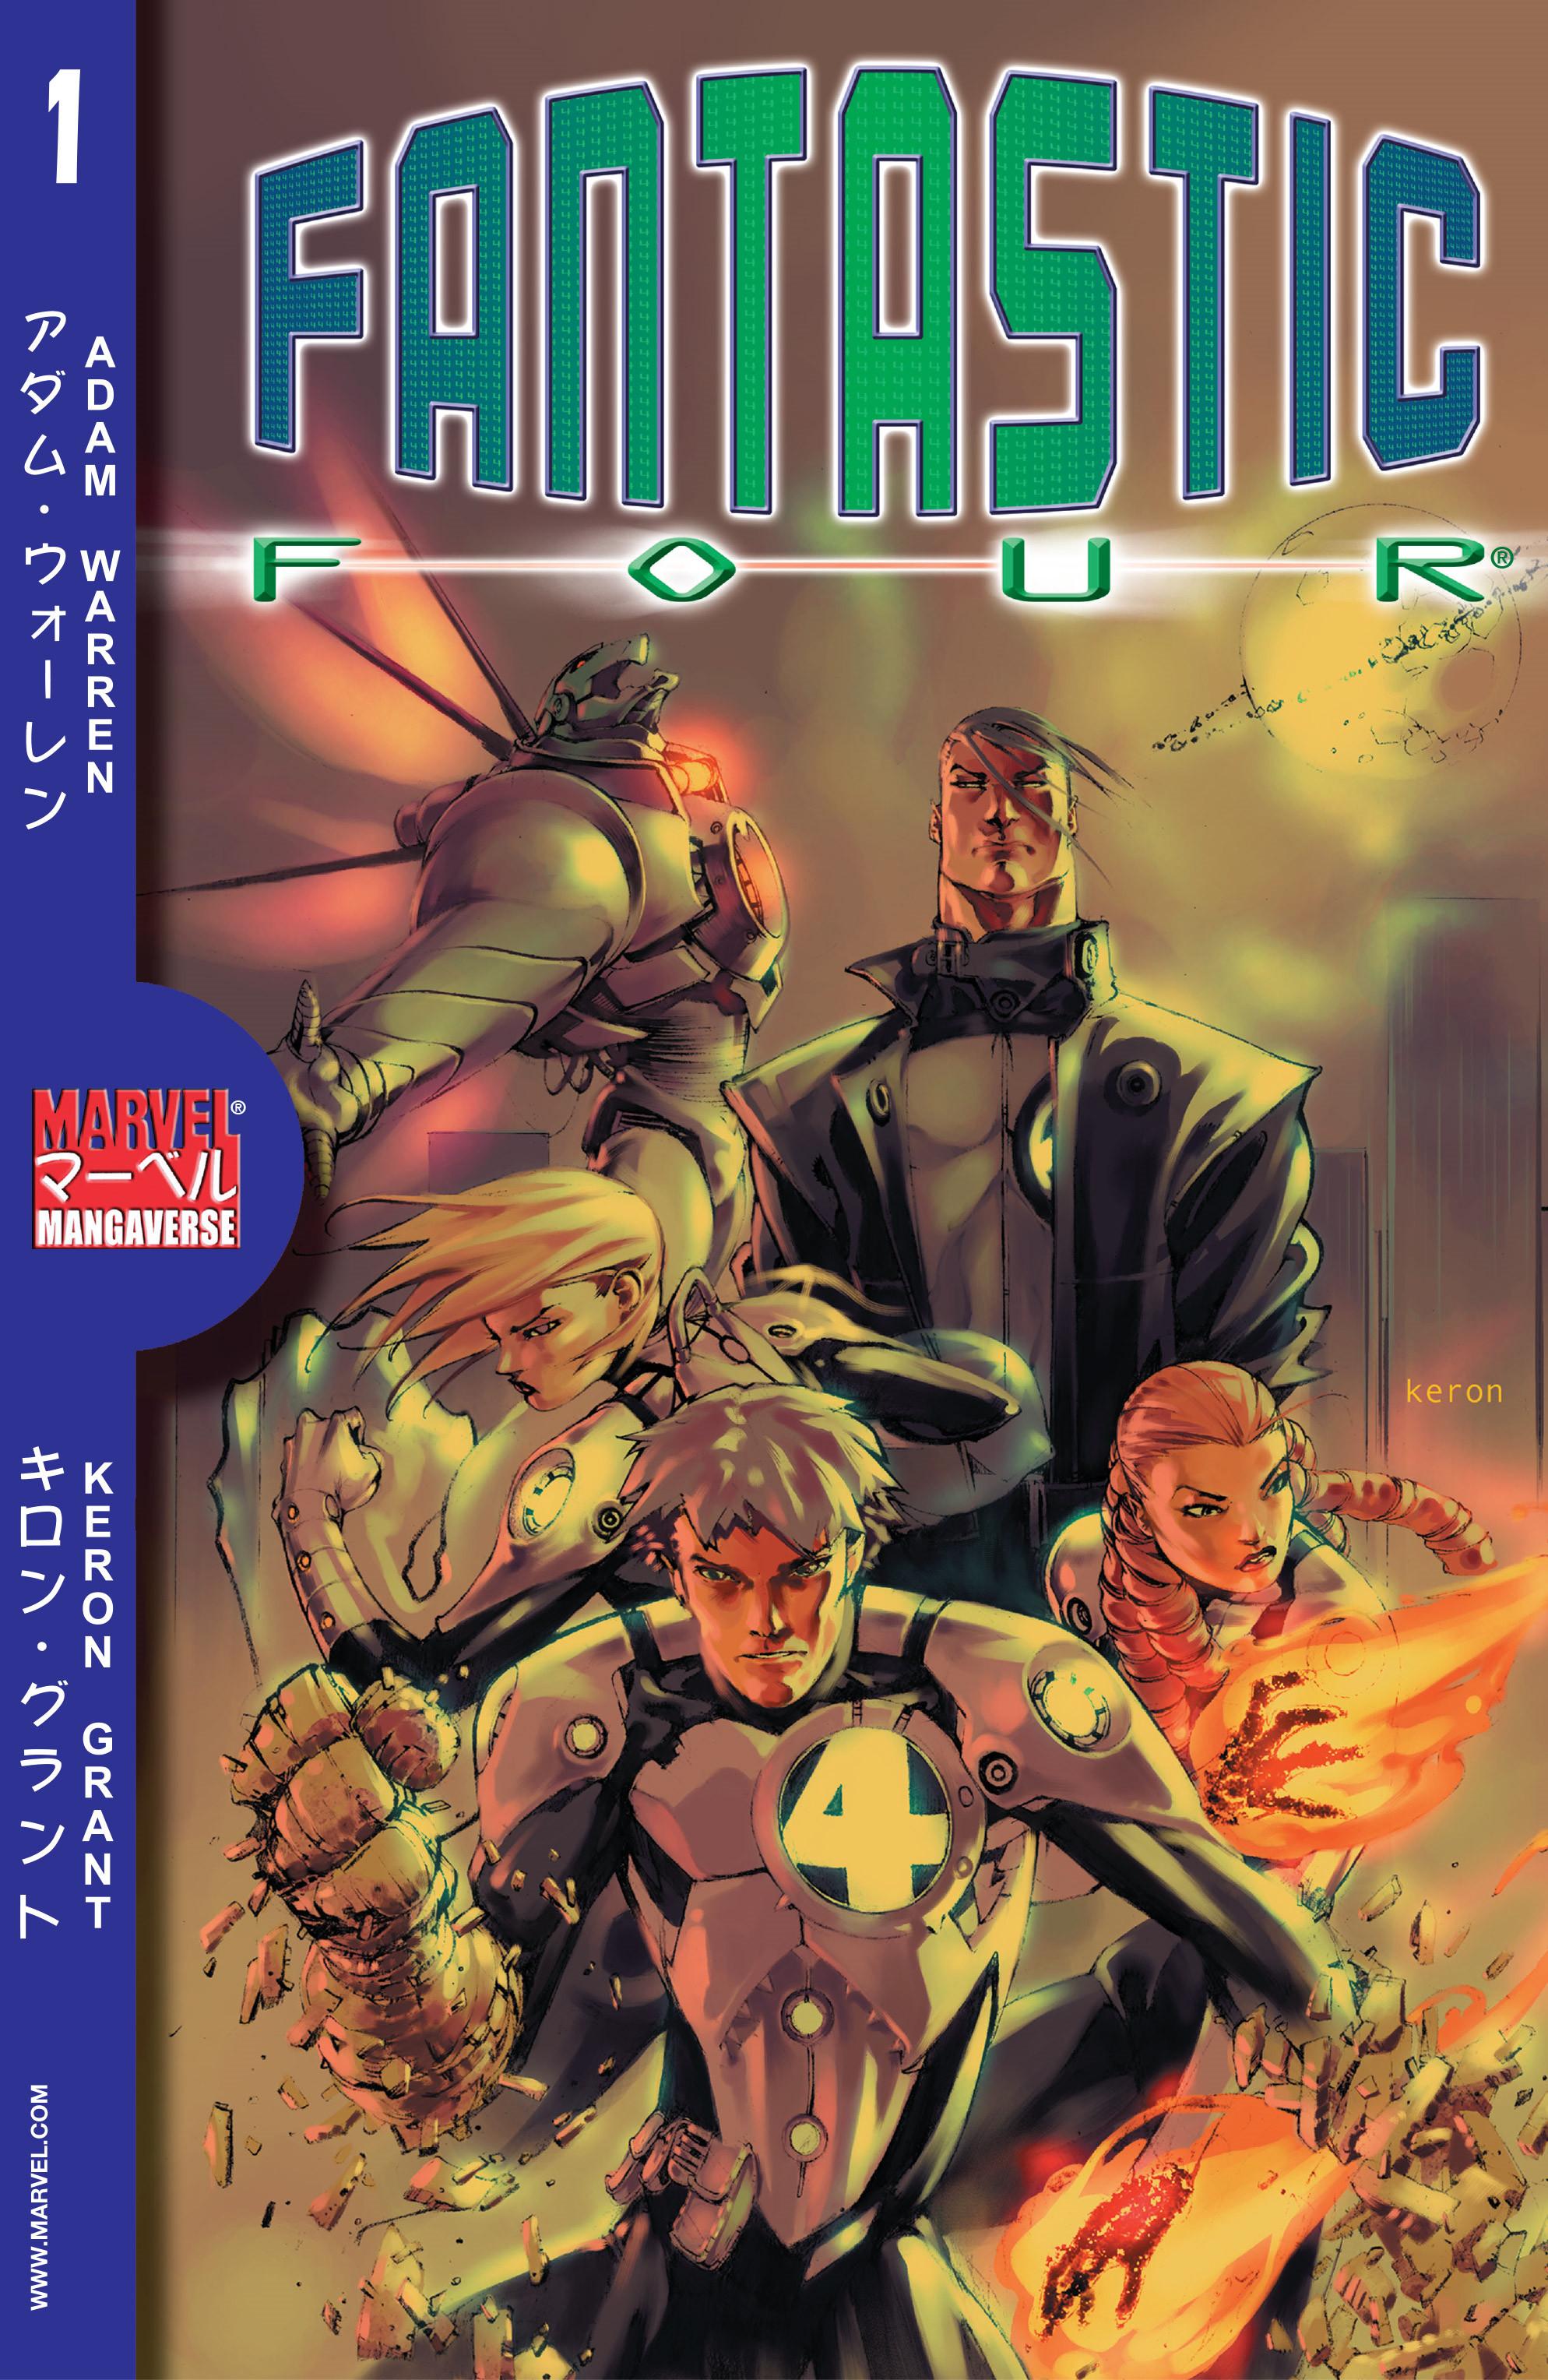 Marvel Mangaverse: Fantastic Four Vol 1 1